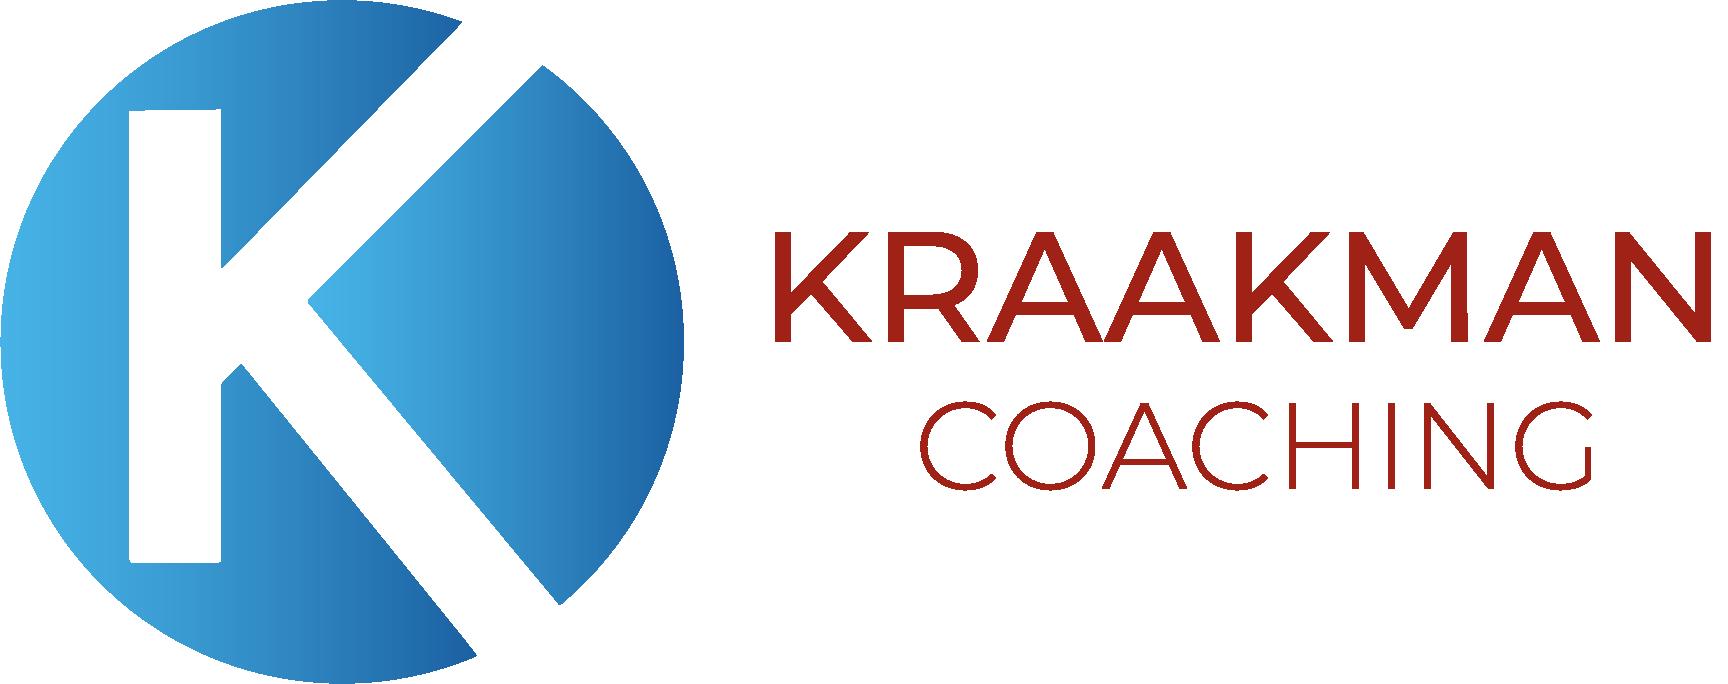 Kraakman Coaching